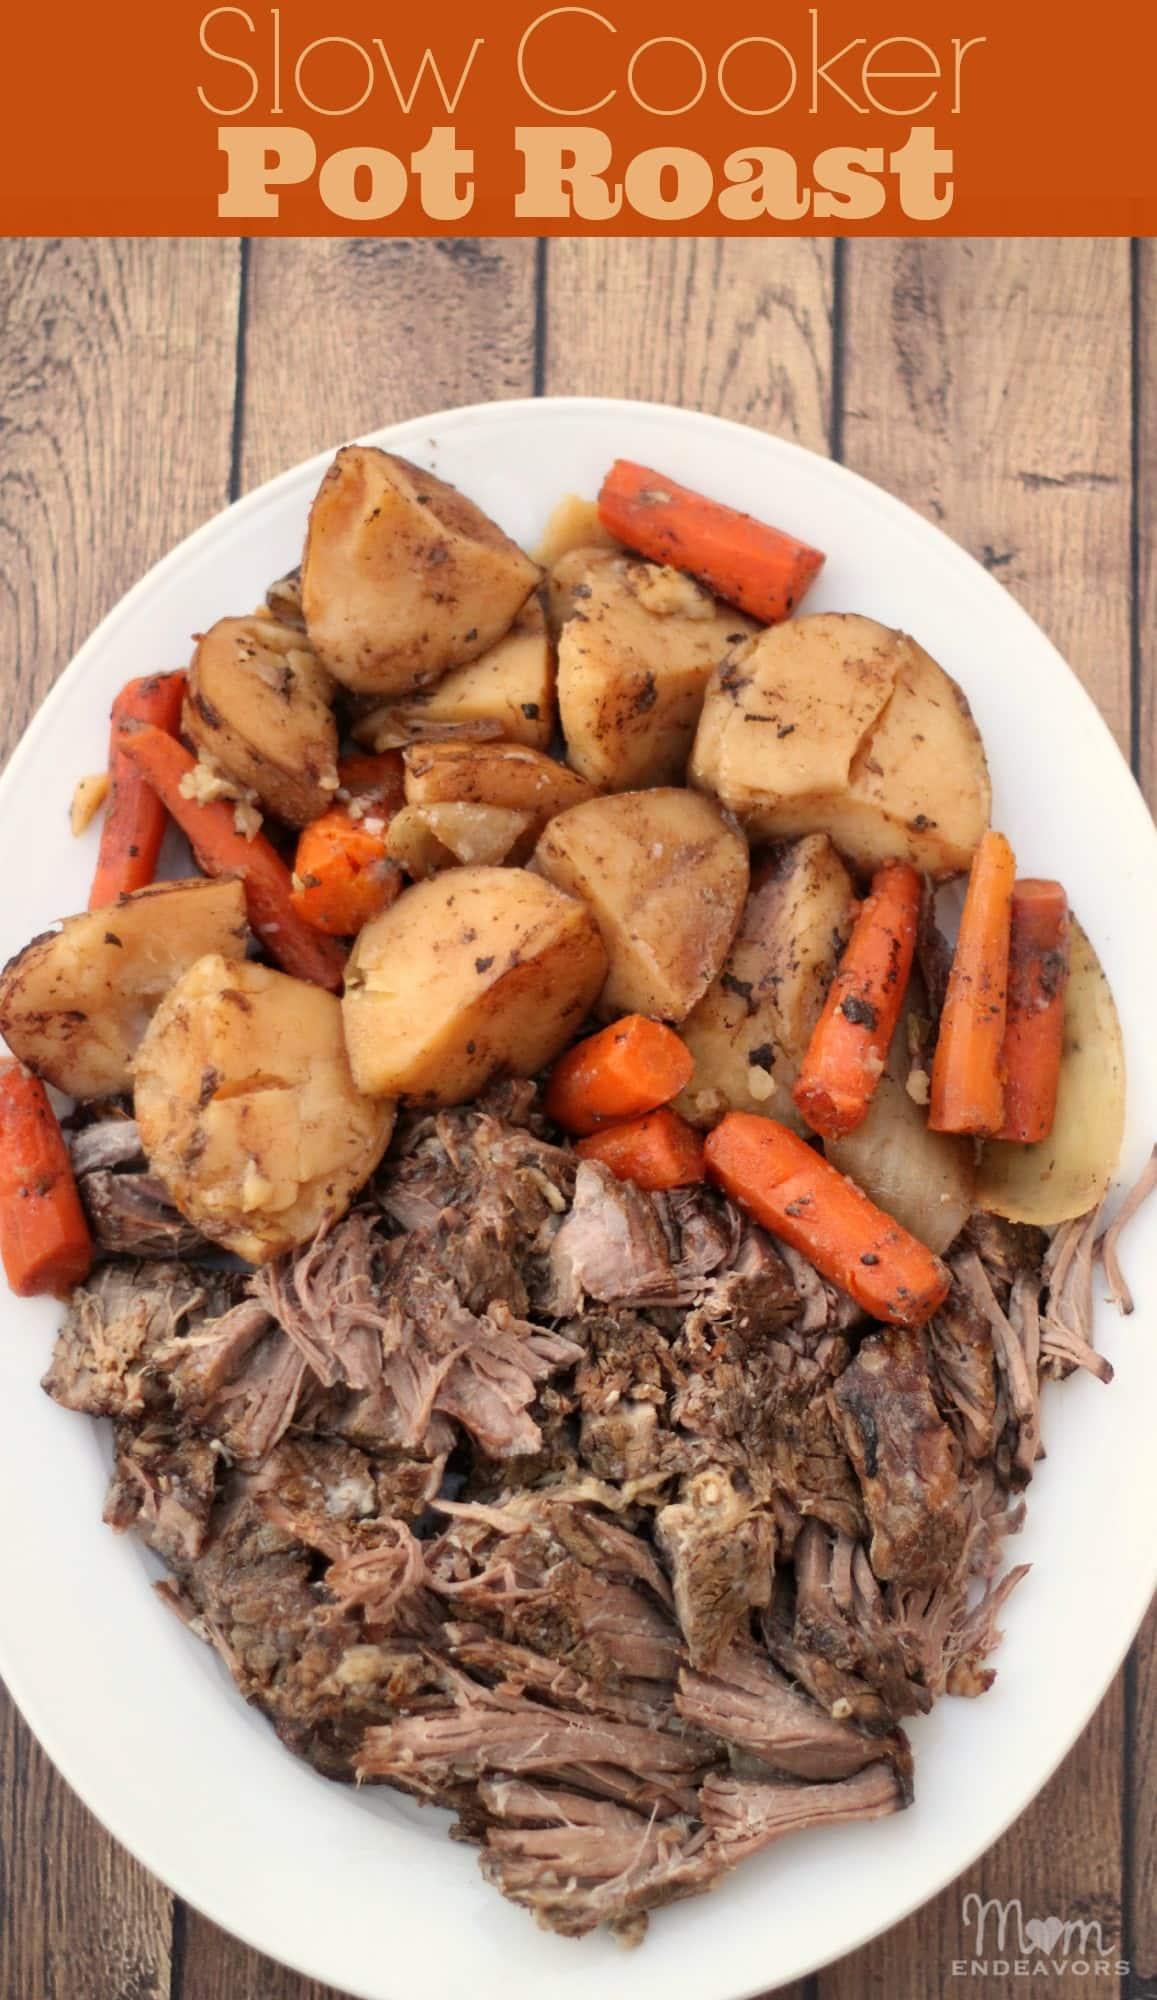 Slow Cooker Pot Roast with Vegetables